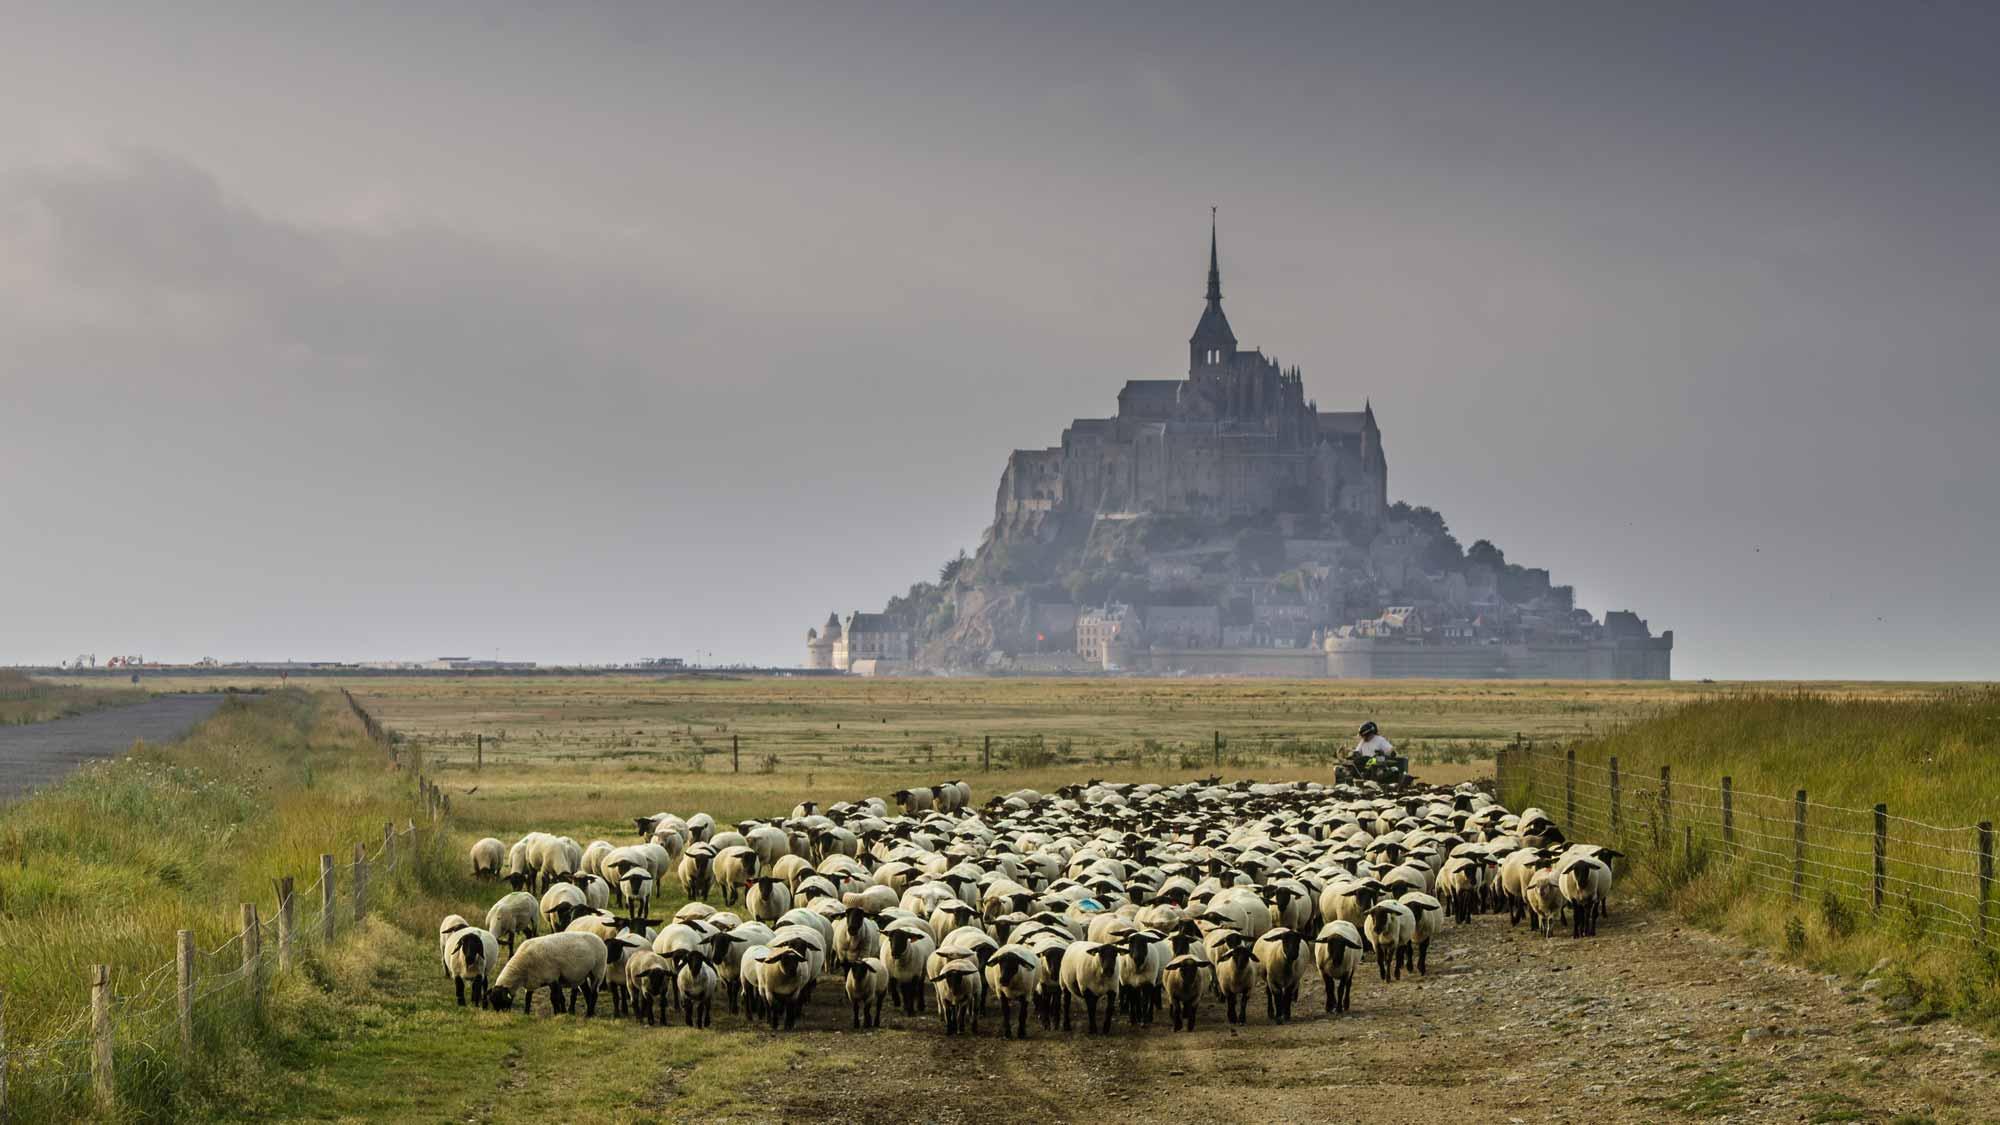 baie-du-mont-saint-michel-03.jpg